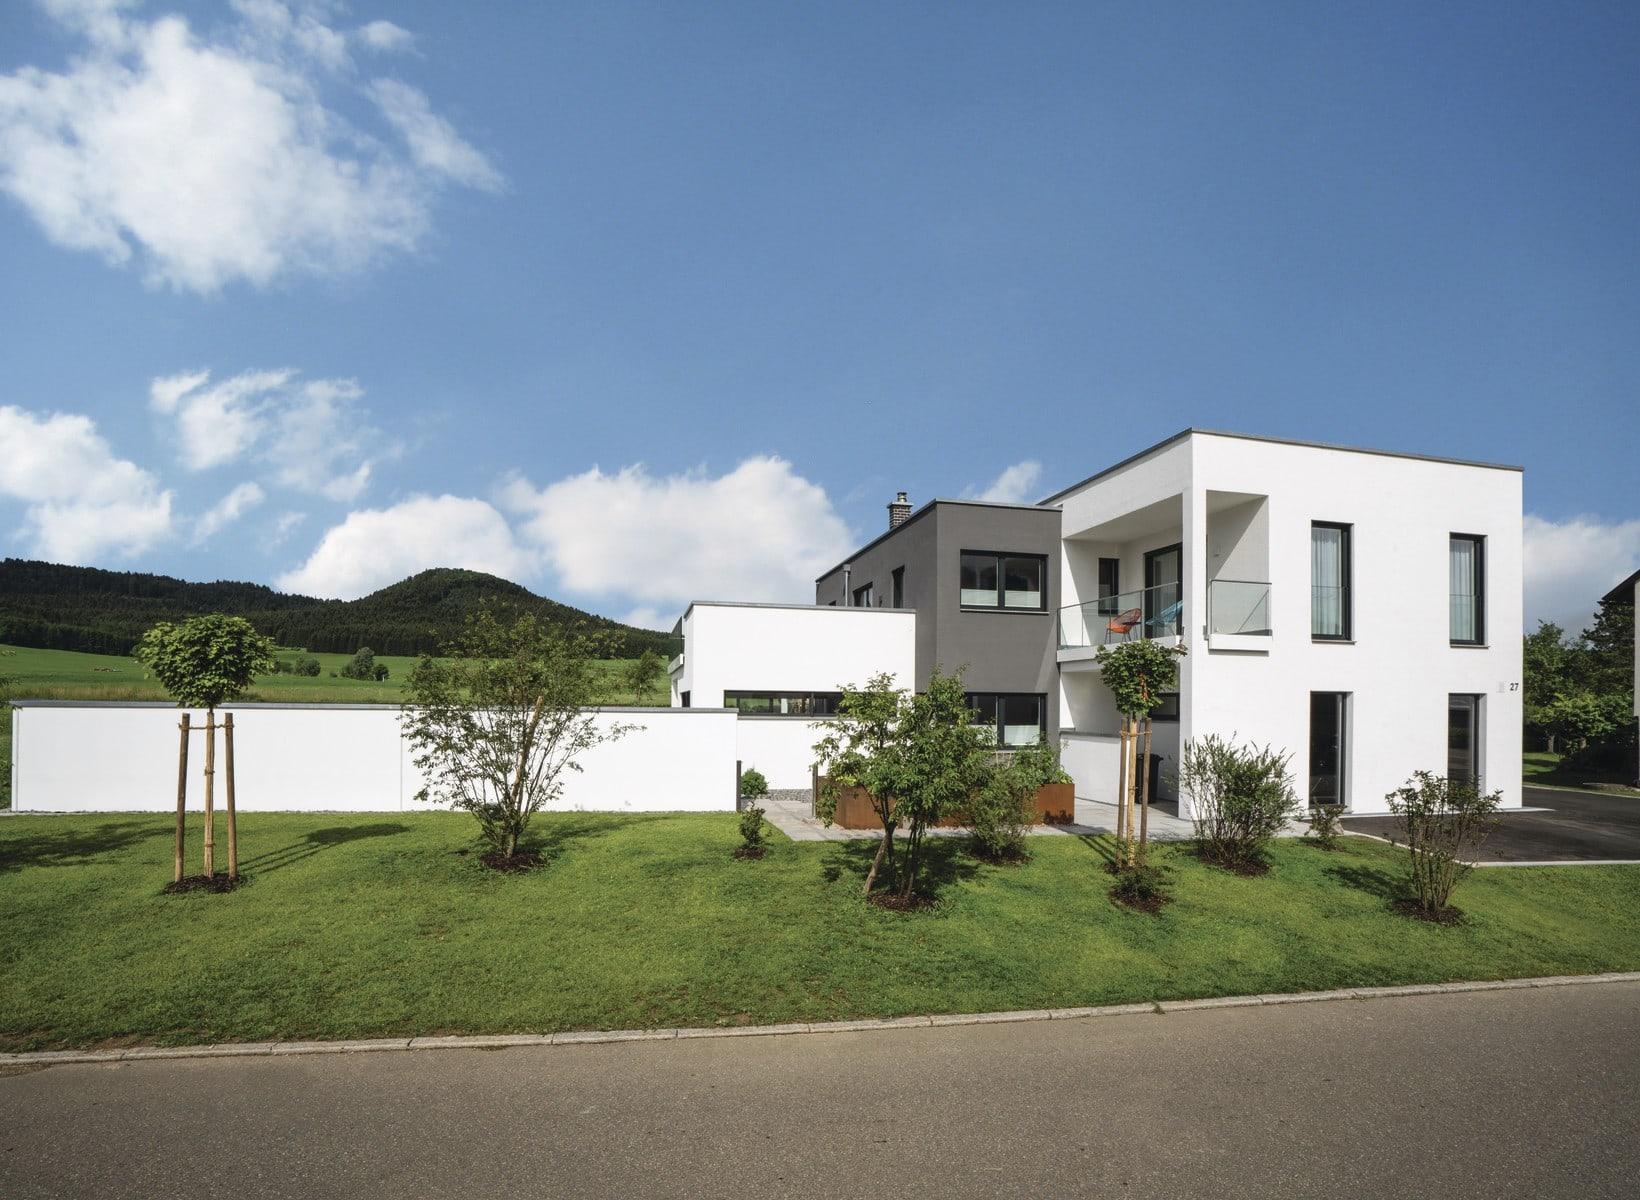 Grosses Einfamilienhaus modern mit Flachdach und Garage bauen - Haus Ideen Bauhaus Villa WeberHaus Fertighaus - HausbauDirekt.de